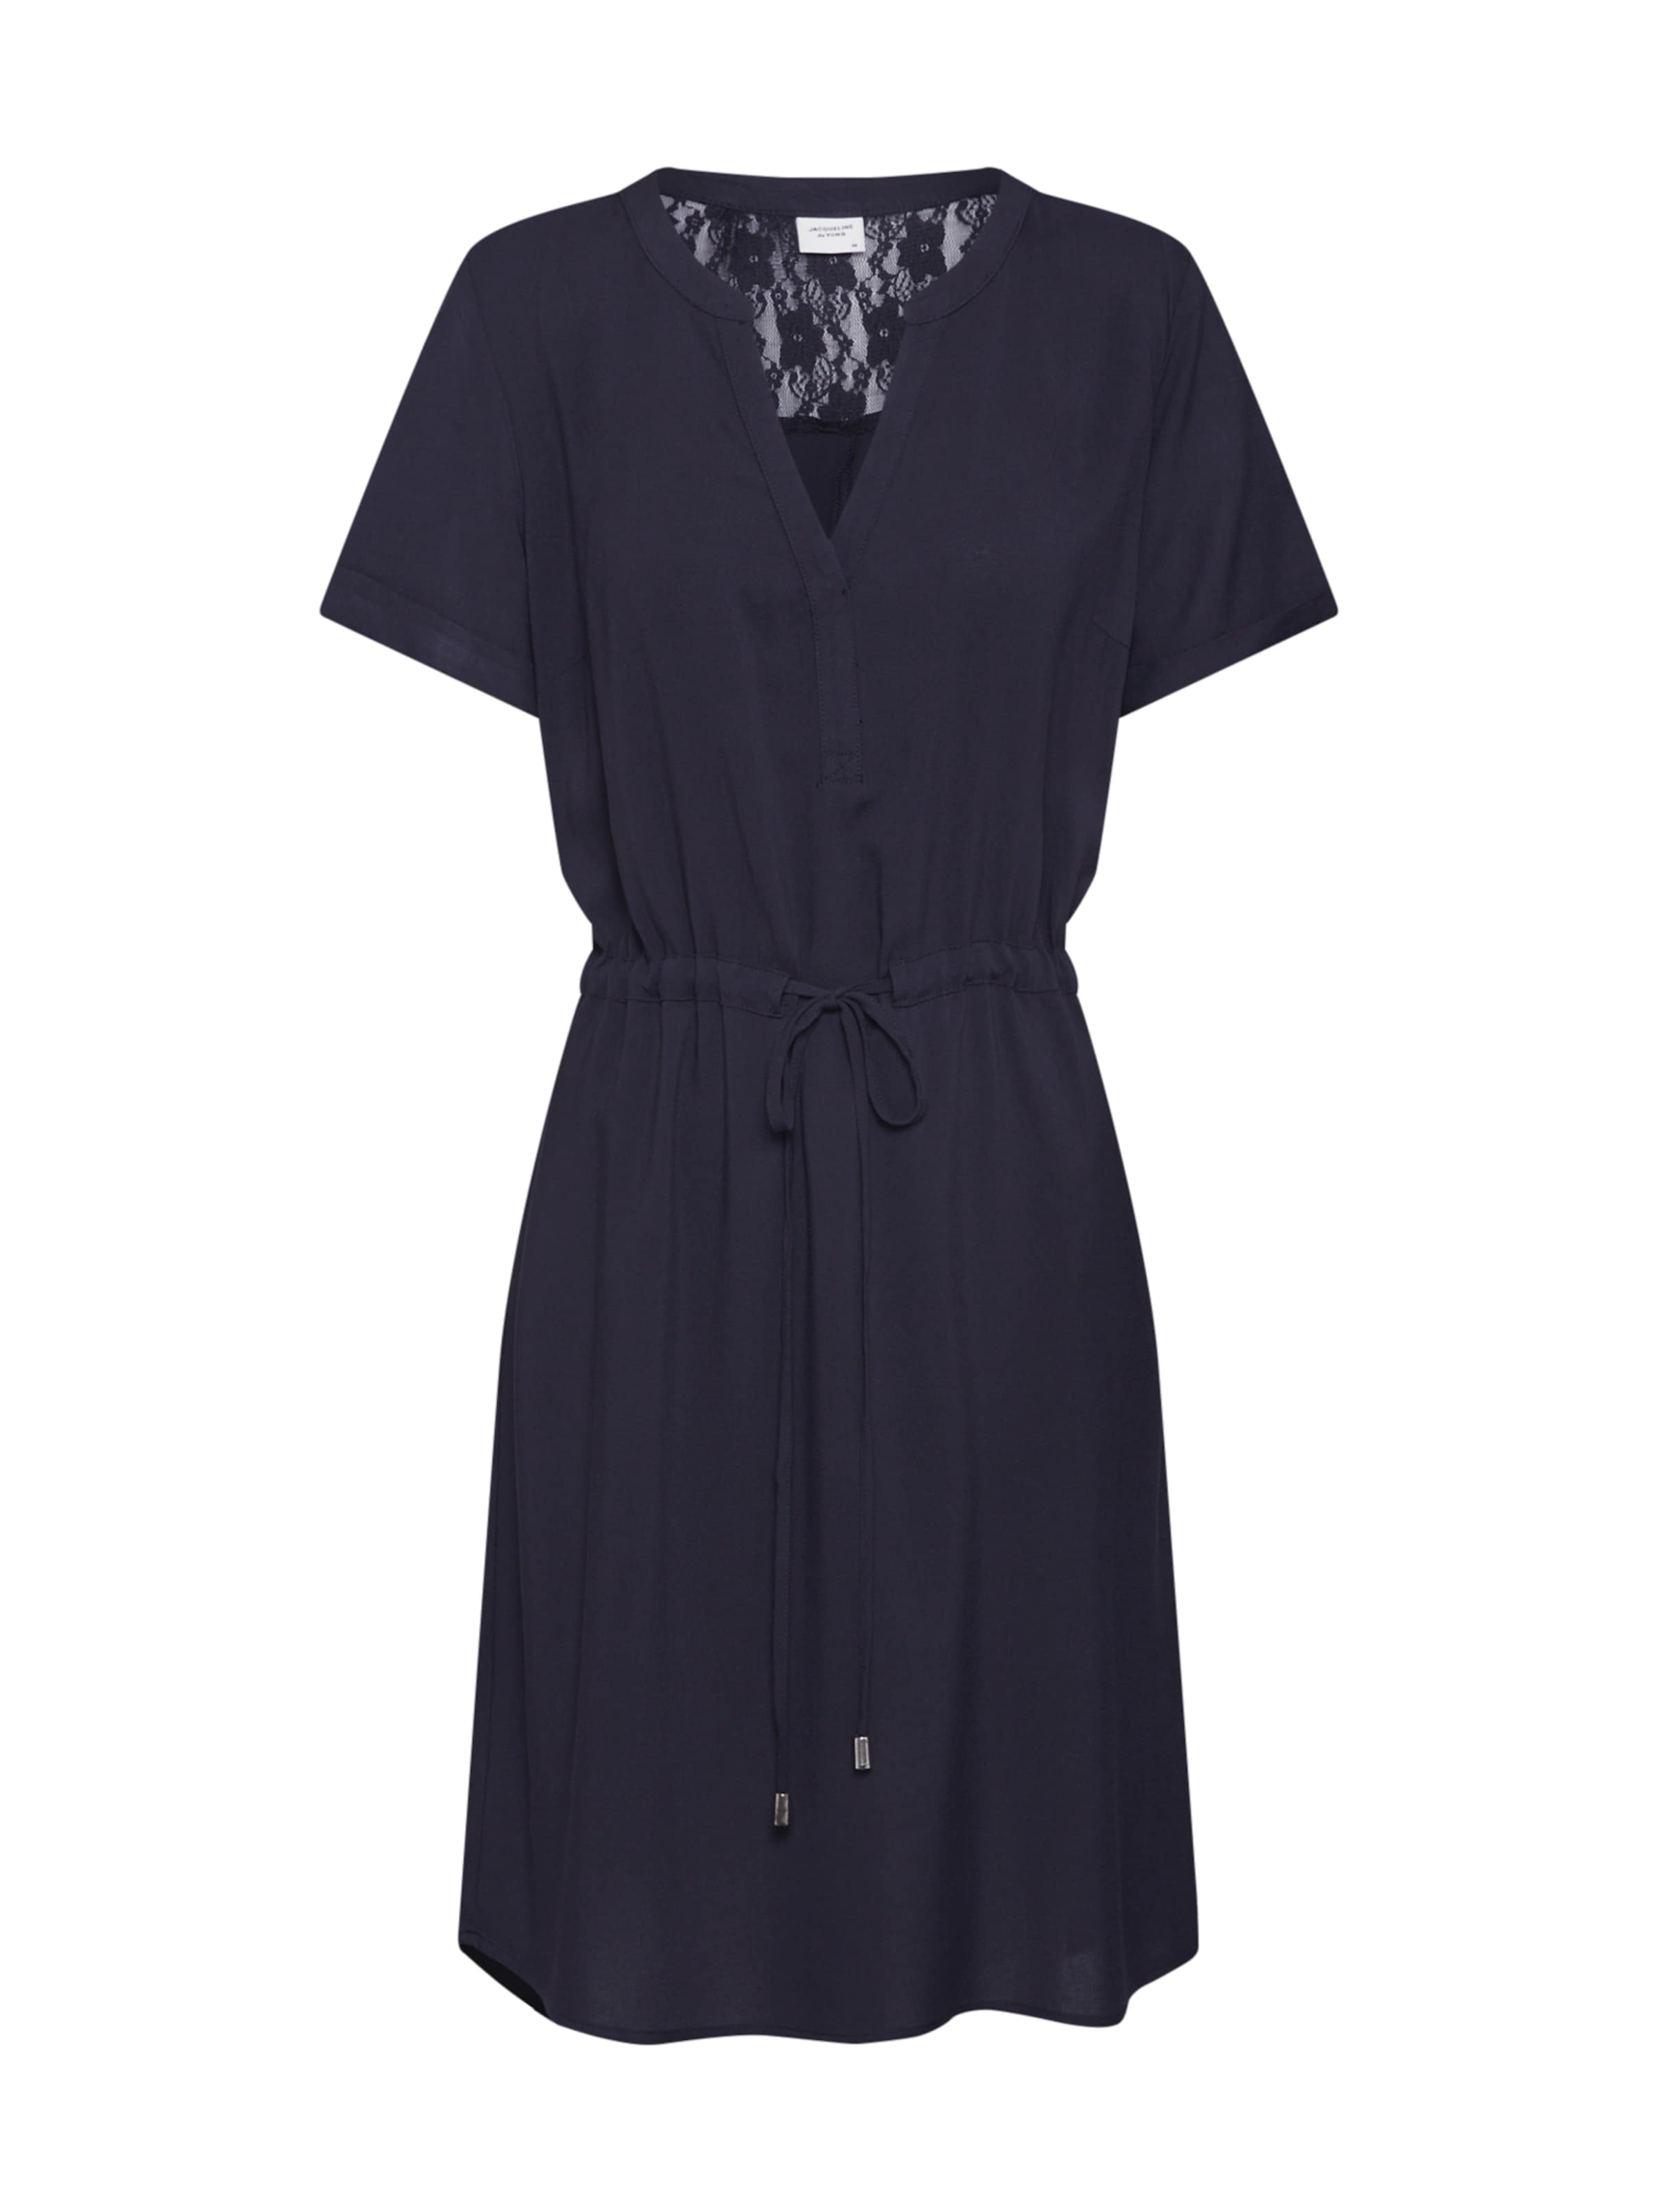 De Kleid Jacqueline Yong In Schwarz 'mason' wNn0OkX8P